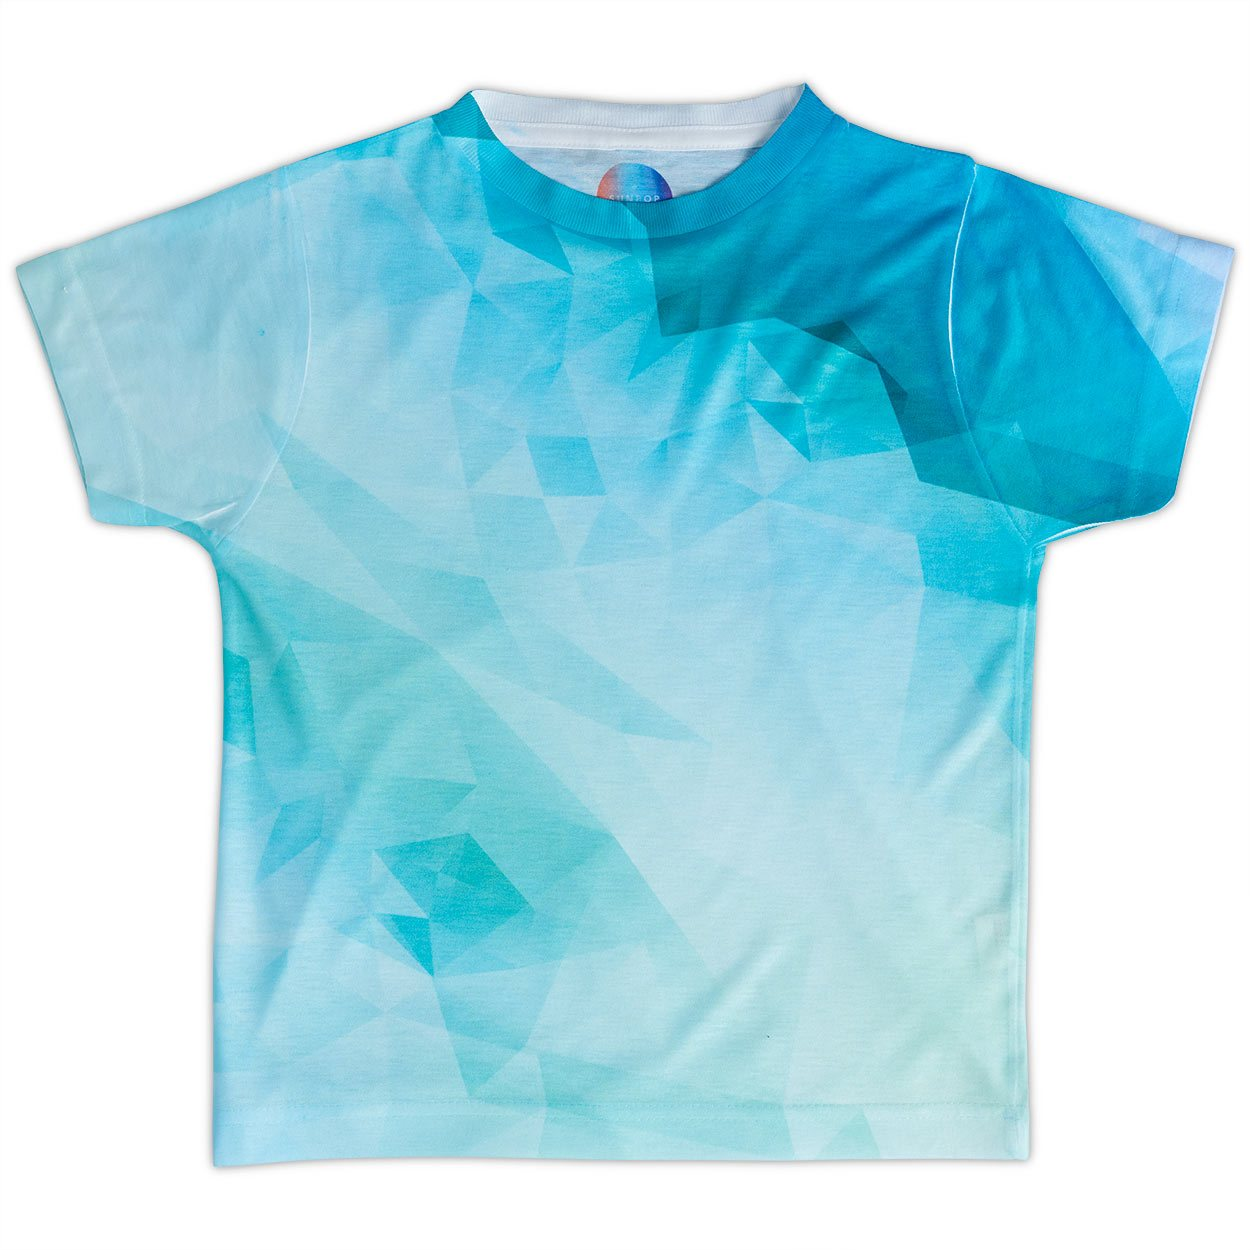 Kids Geometrical Graphic Tshirt Green Aqua Size Xs L Unisex Geo Tropical Sunpoplife